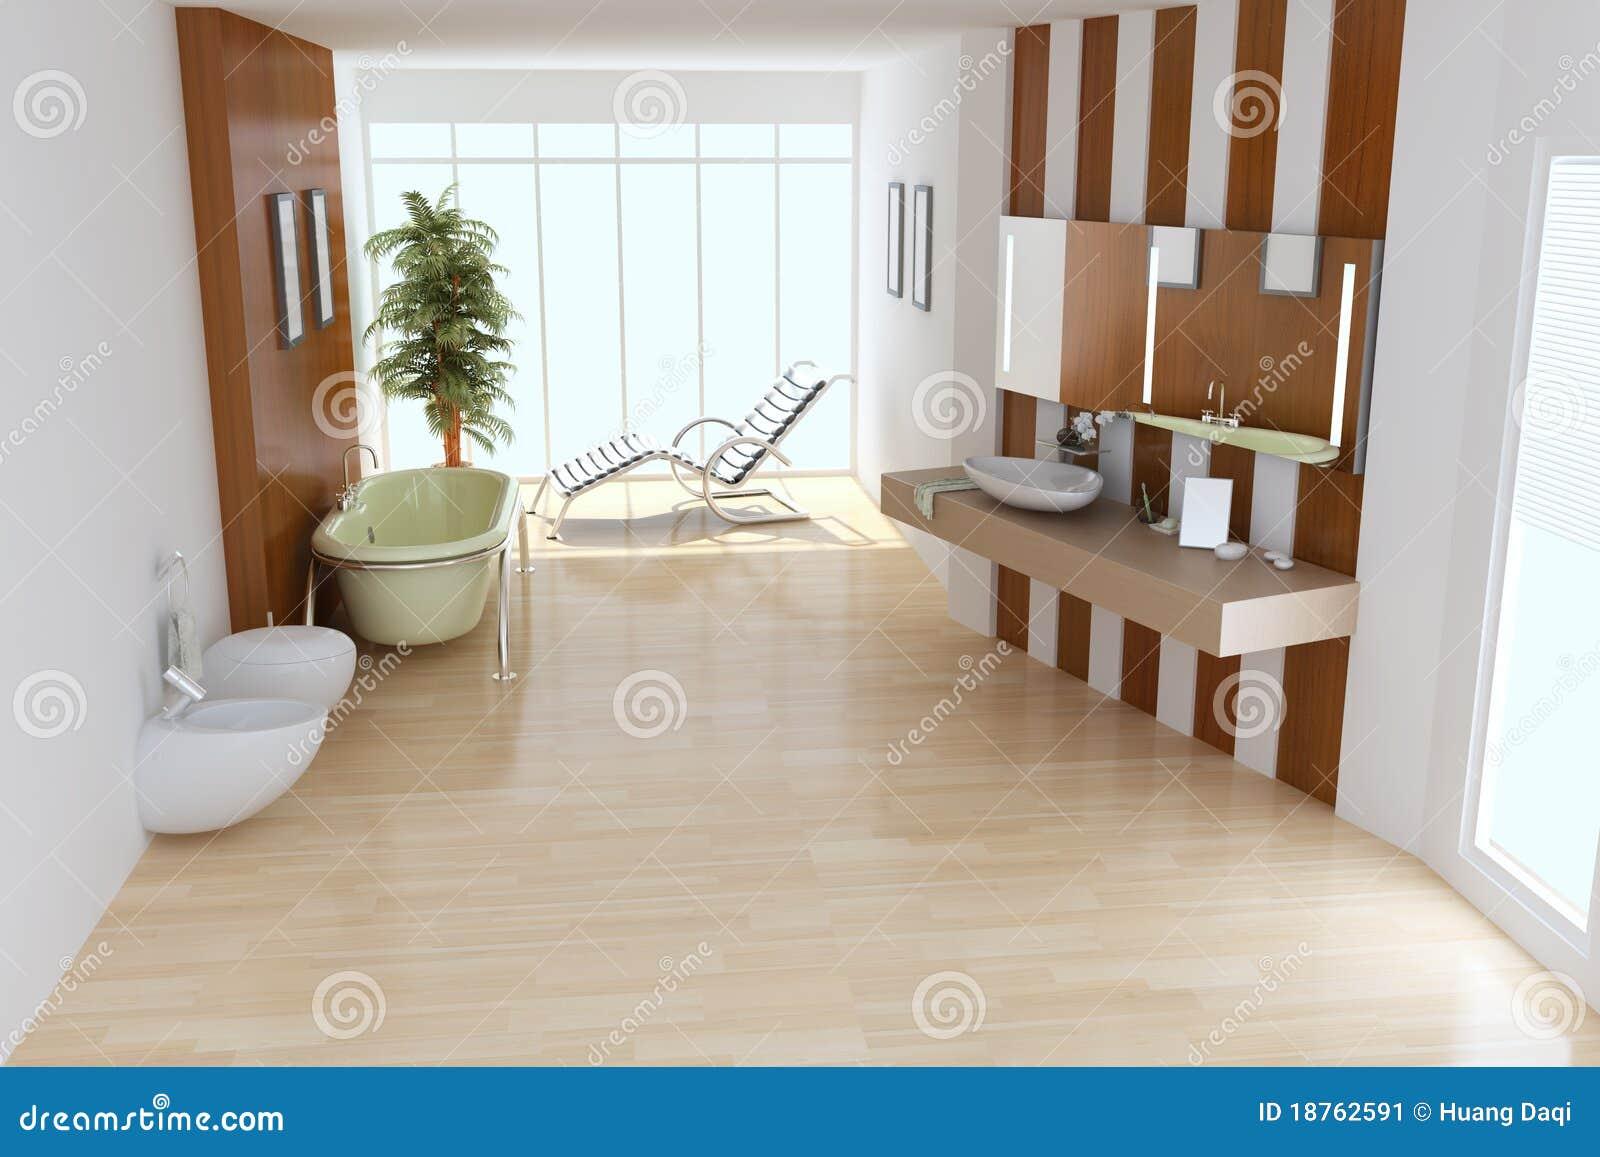 Tocador moderno resultado de imagen para tocador moderno - Tocador moderno dormitorio ...